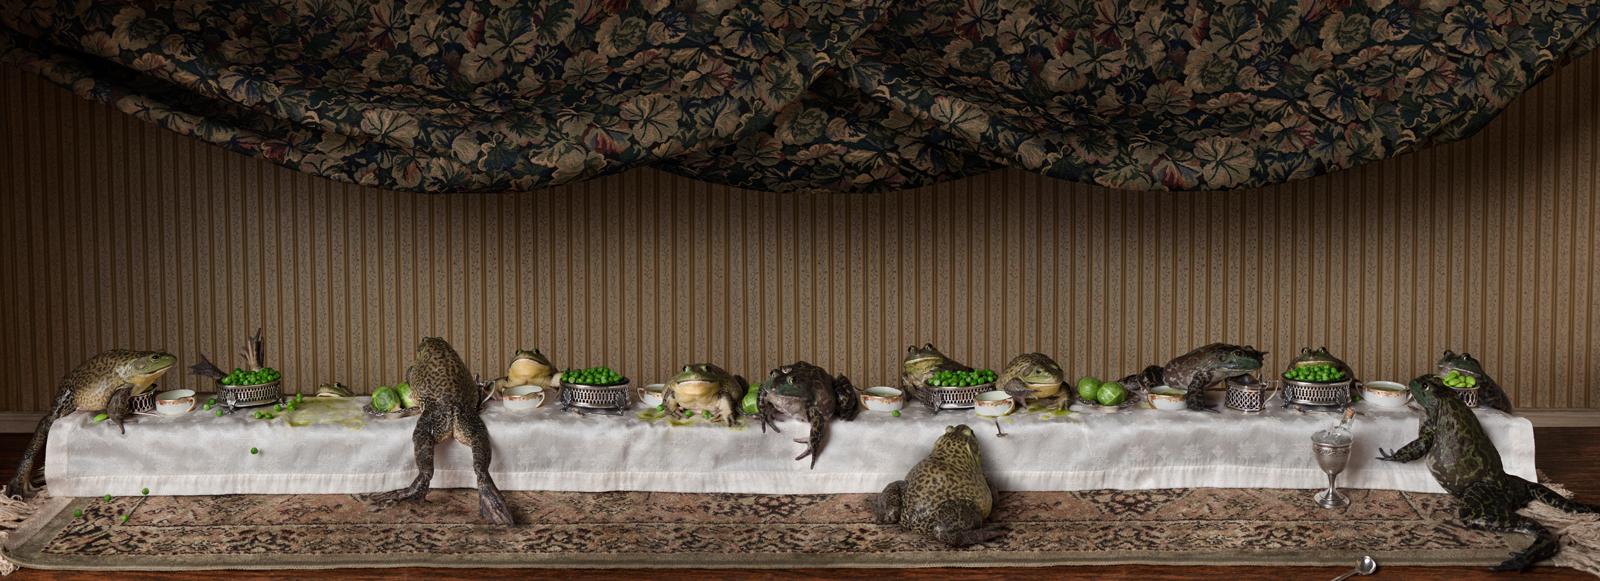 The Bullfrog Feast  United States, 2014